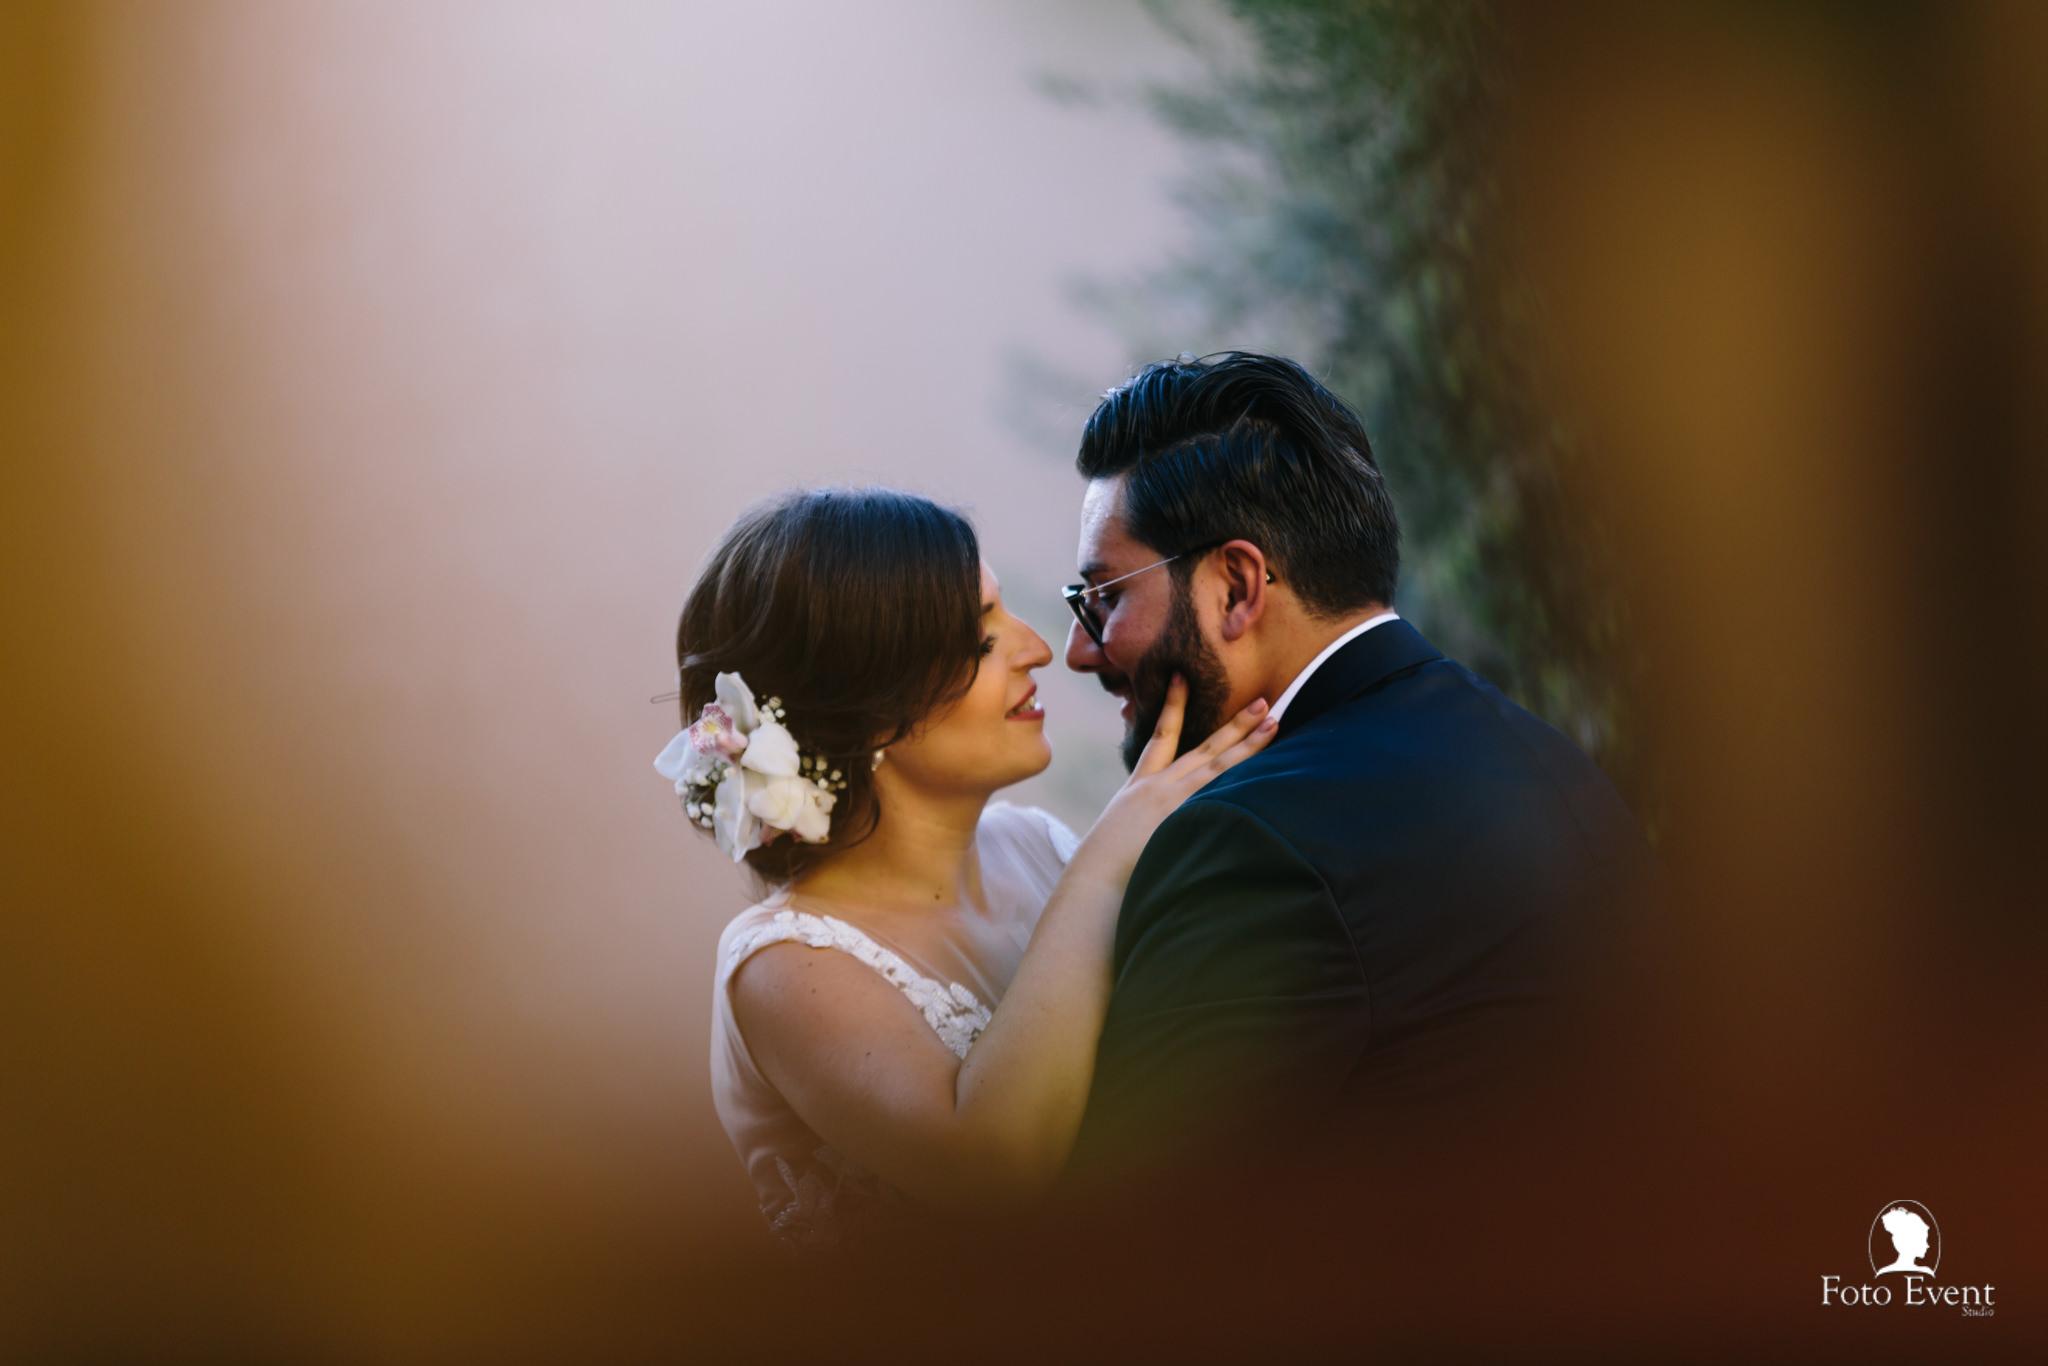 028-2019-09-09-Matrimonio-Dorotea-e-Alberto-Iemmolo-zoom-430